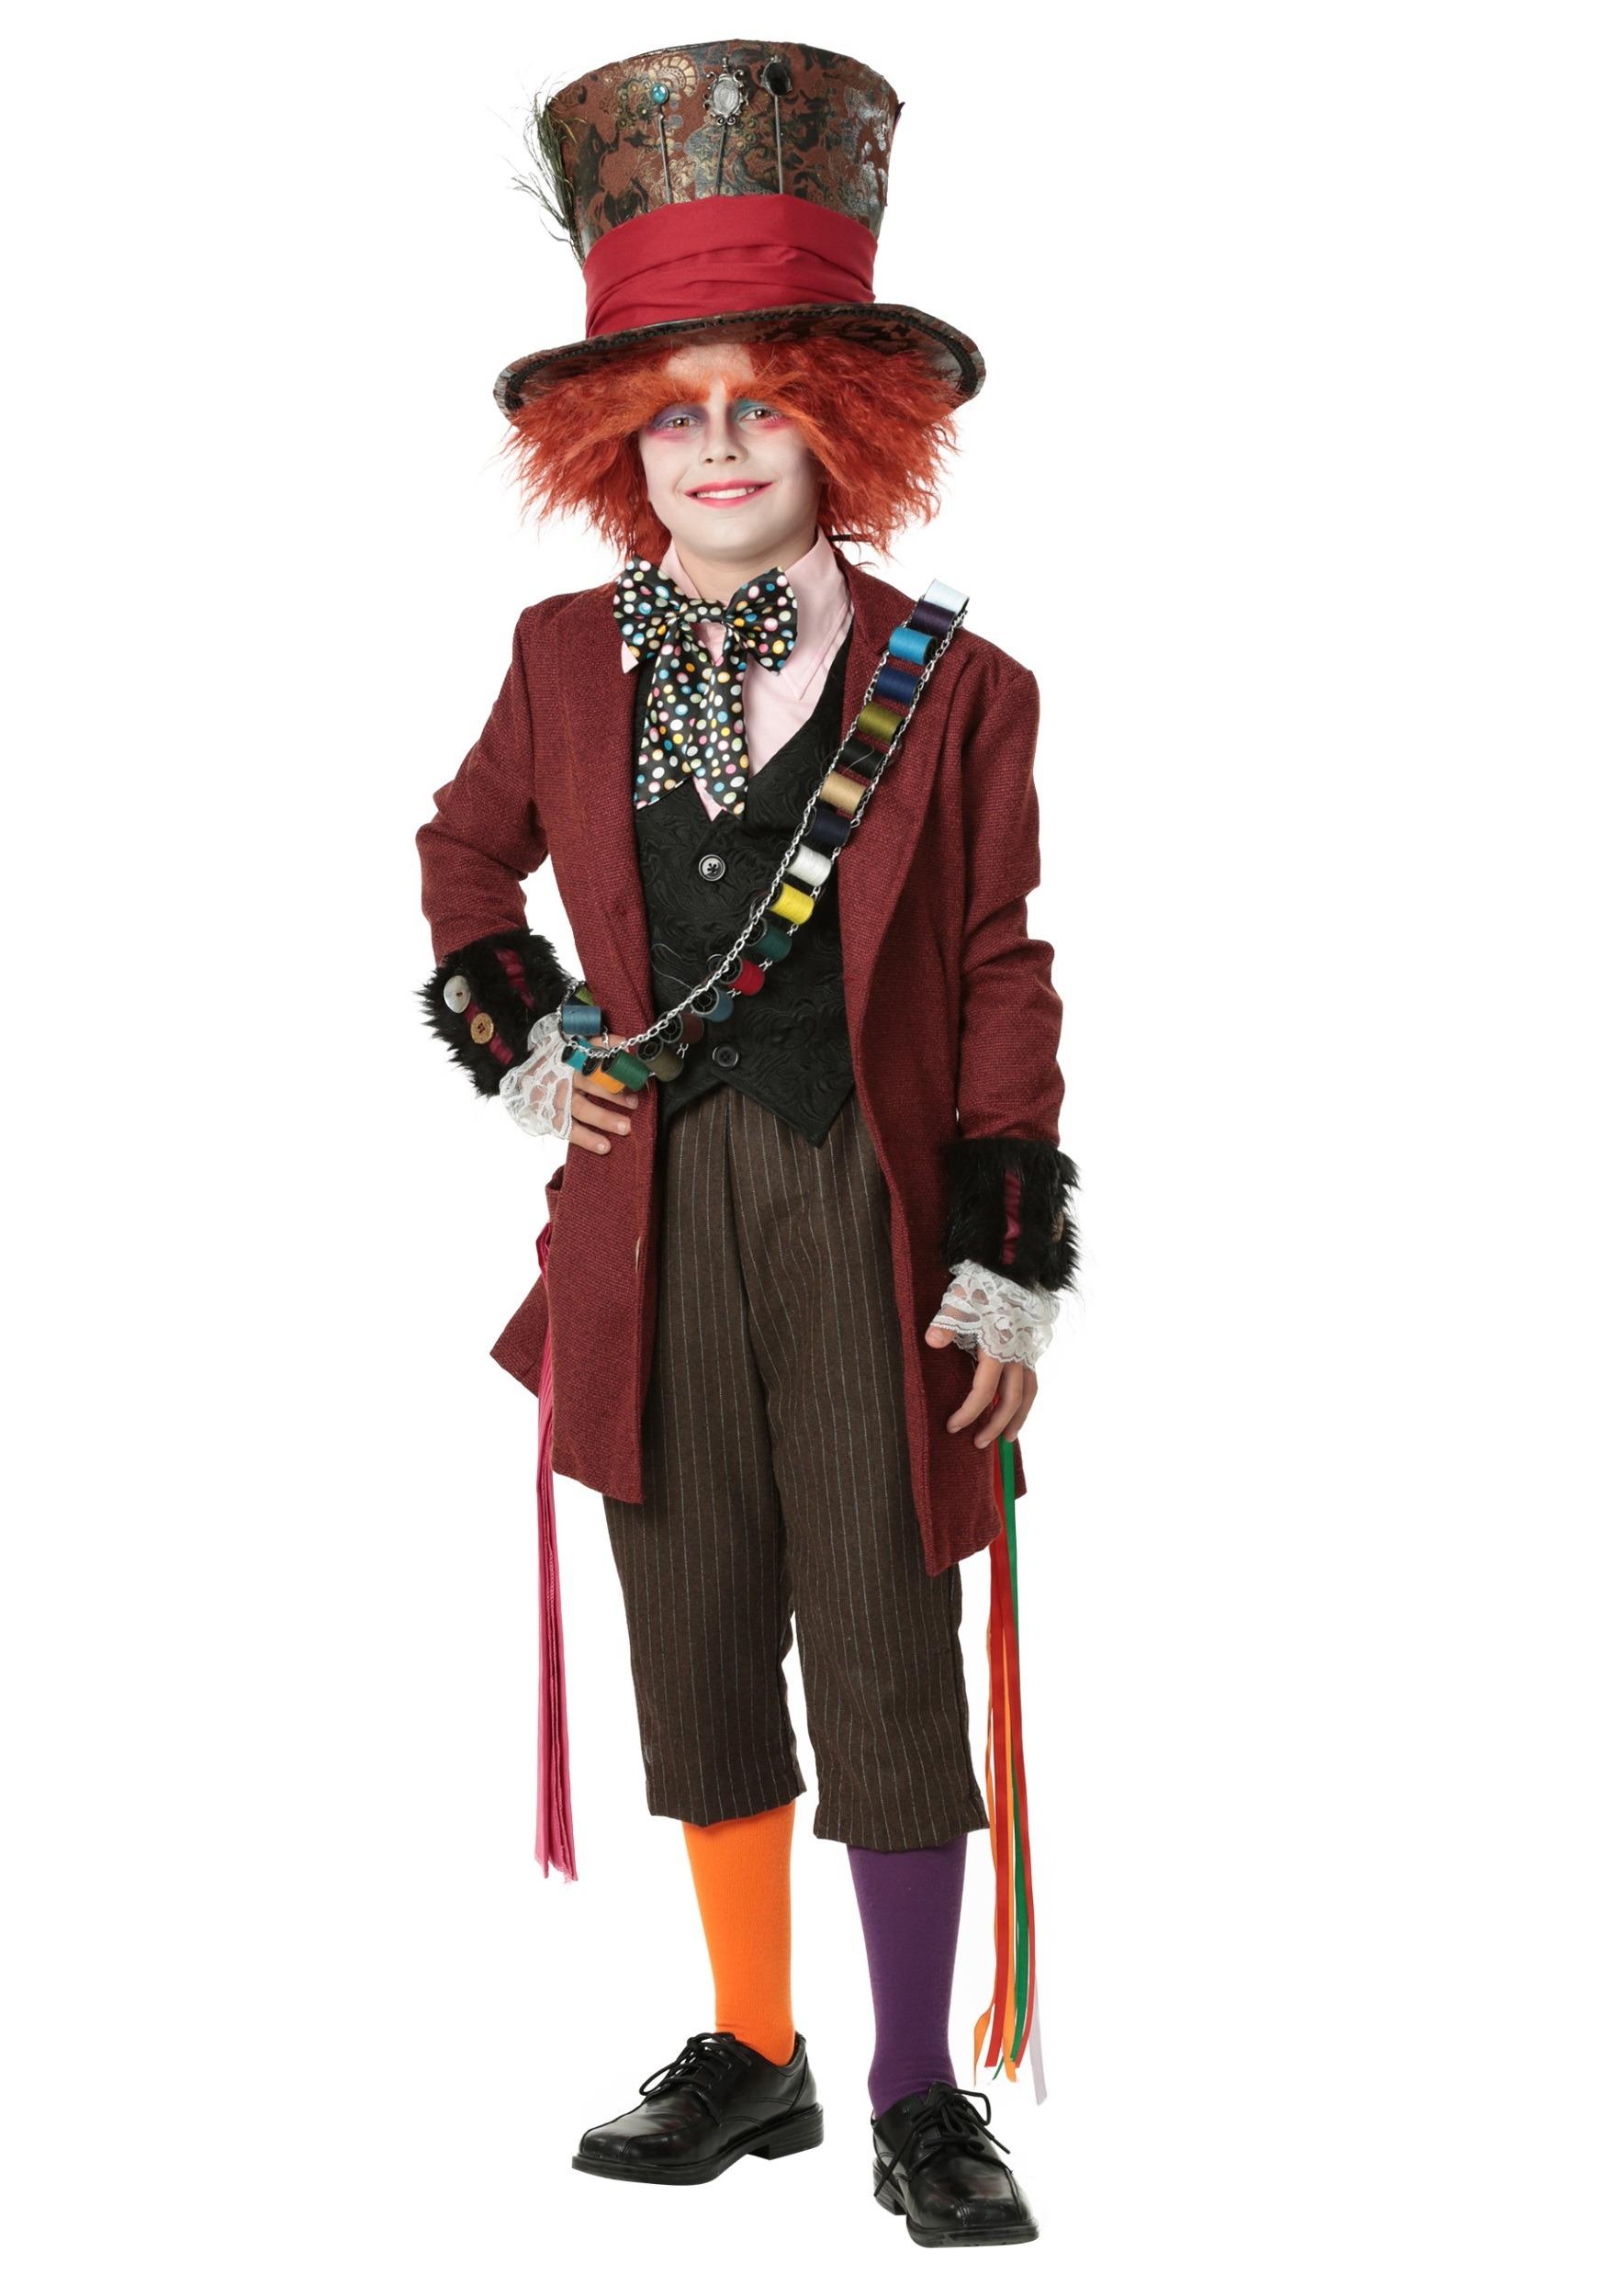 Authentic Halloween Costumes For Men